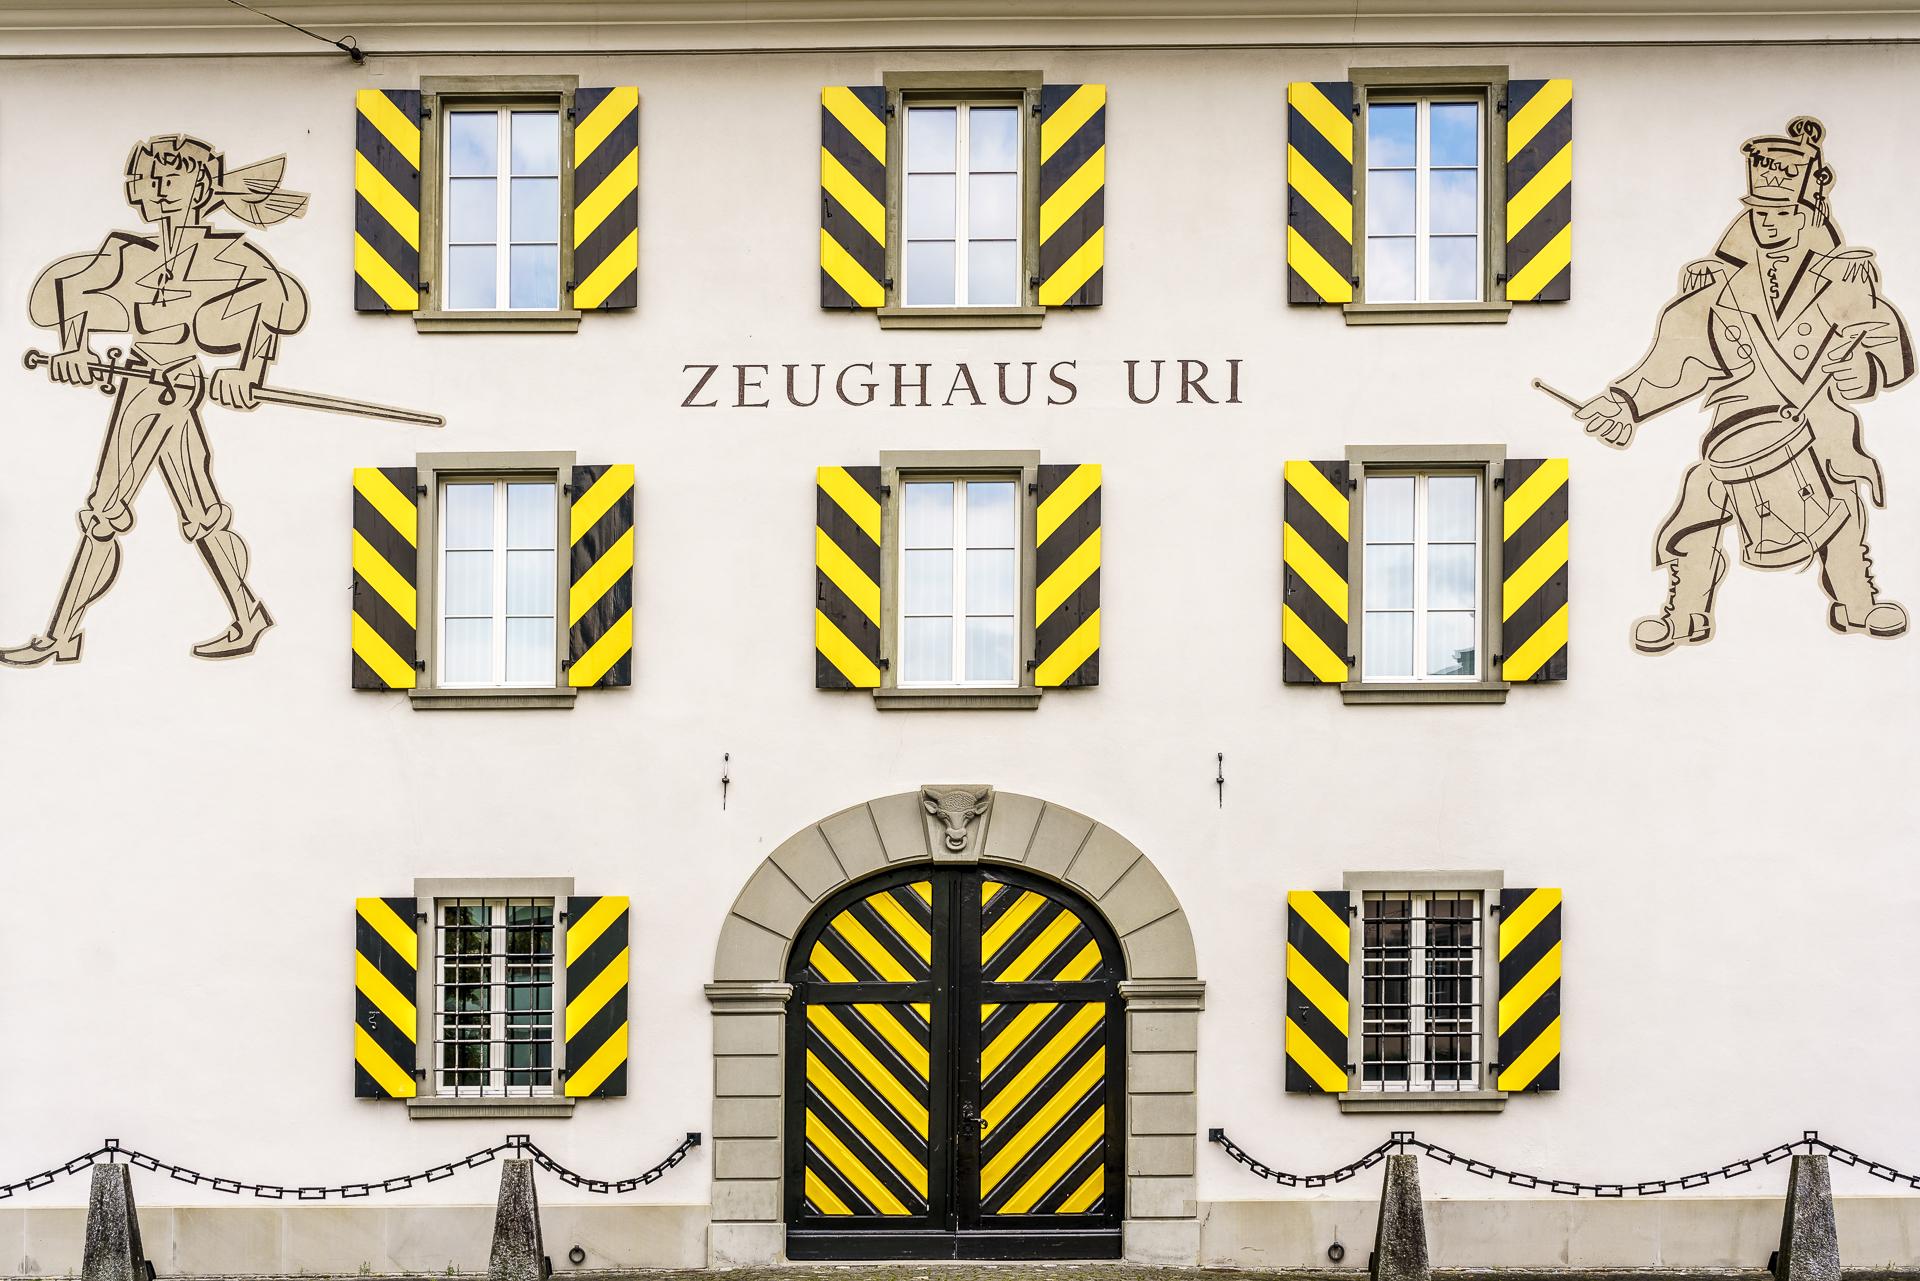 zeughaus-uri